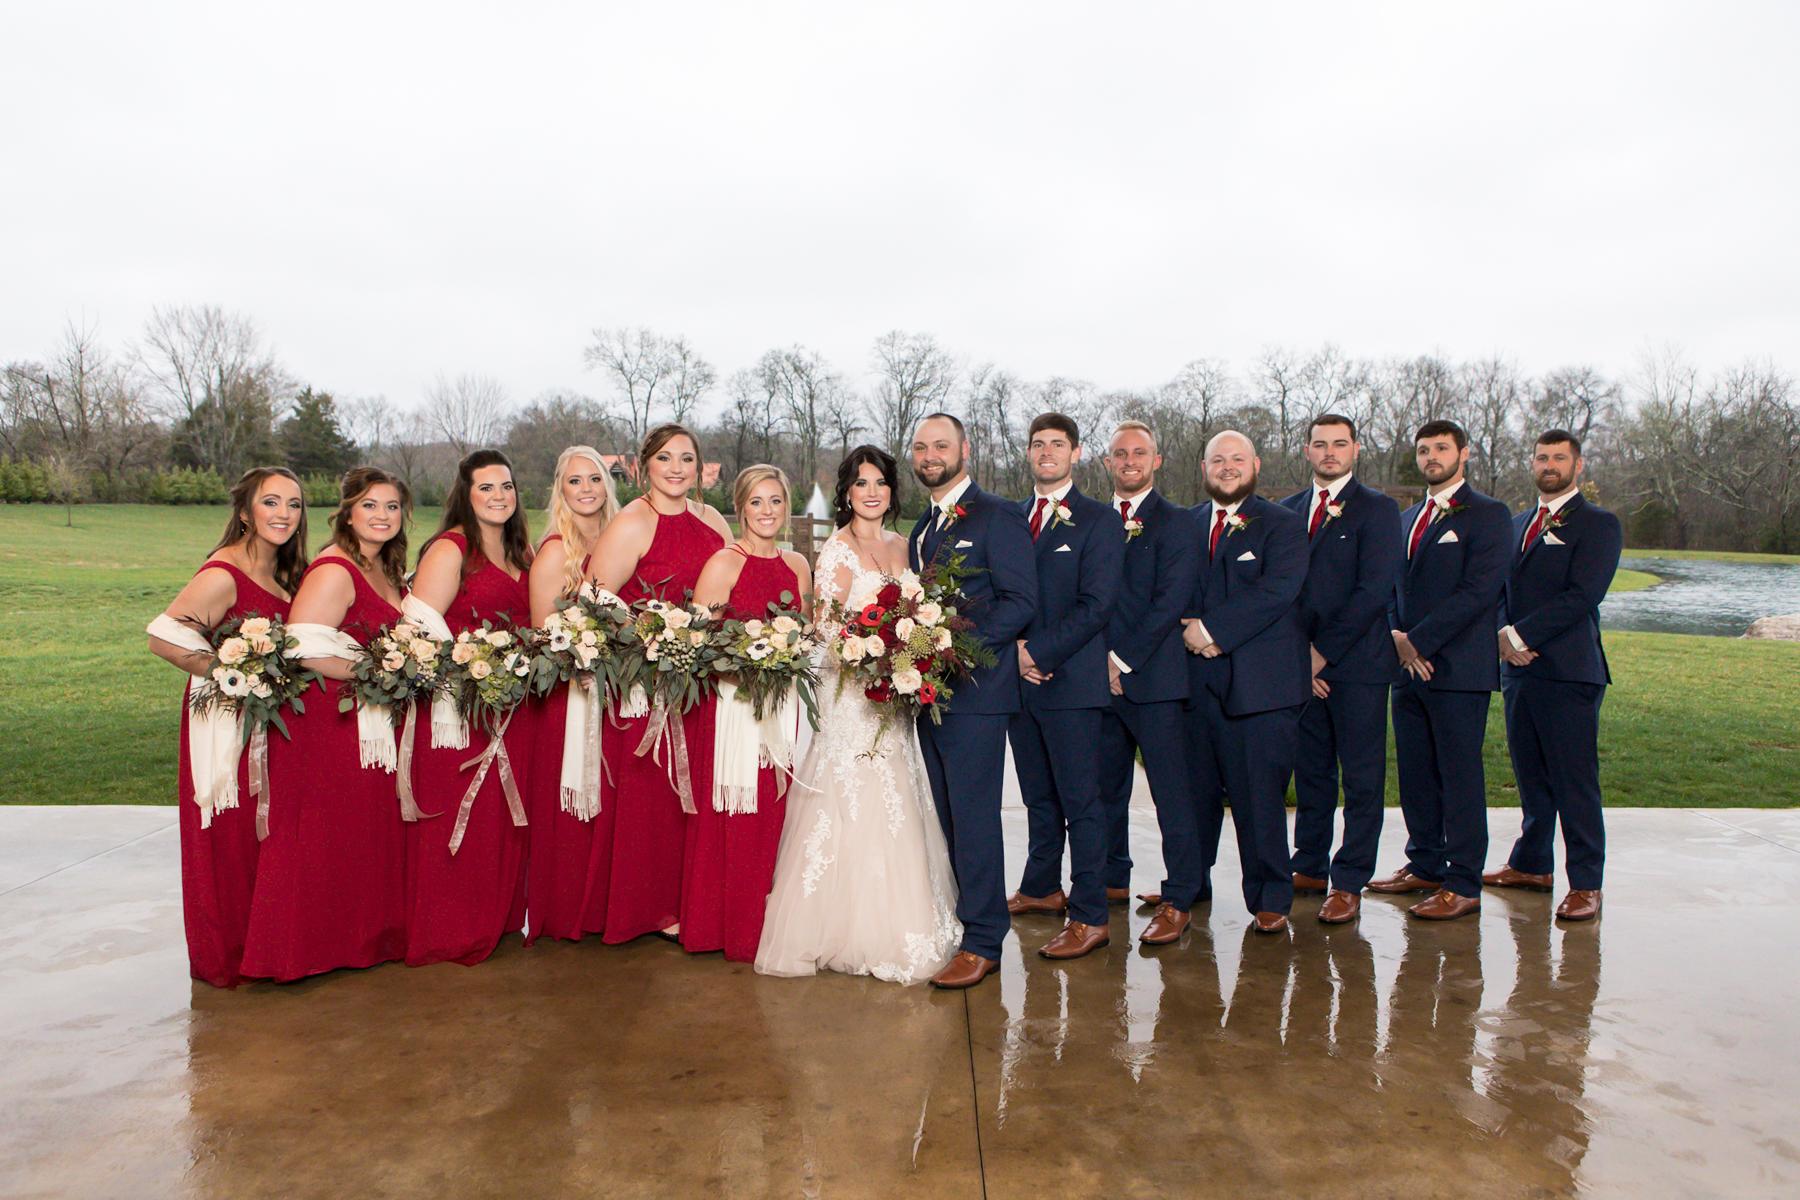 The-Barn-at-Sycamore-Farms-wedding-Shawn-and-Hayden-0296.jpg